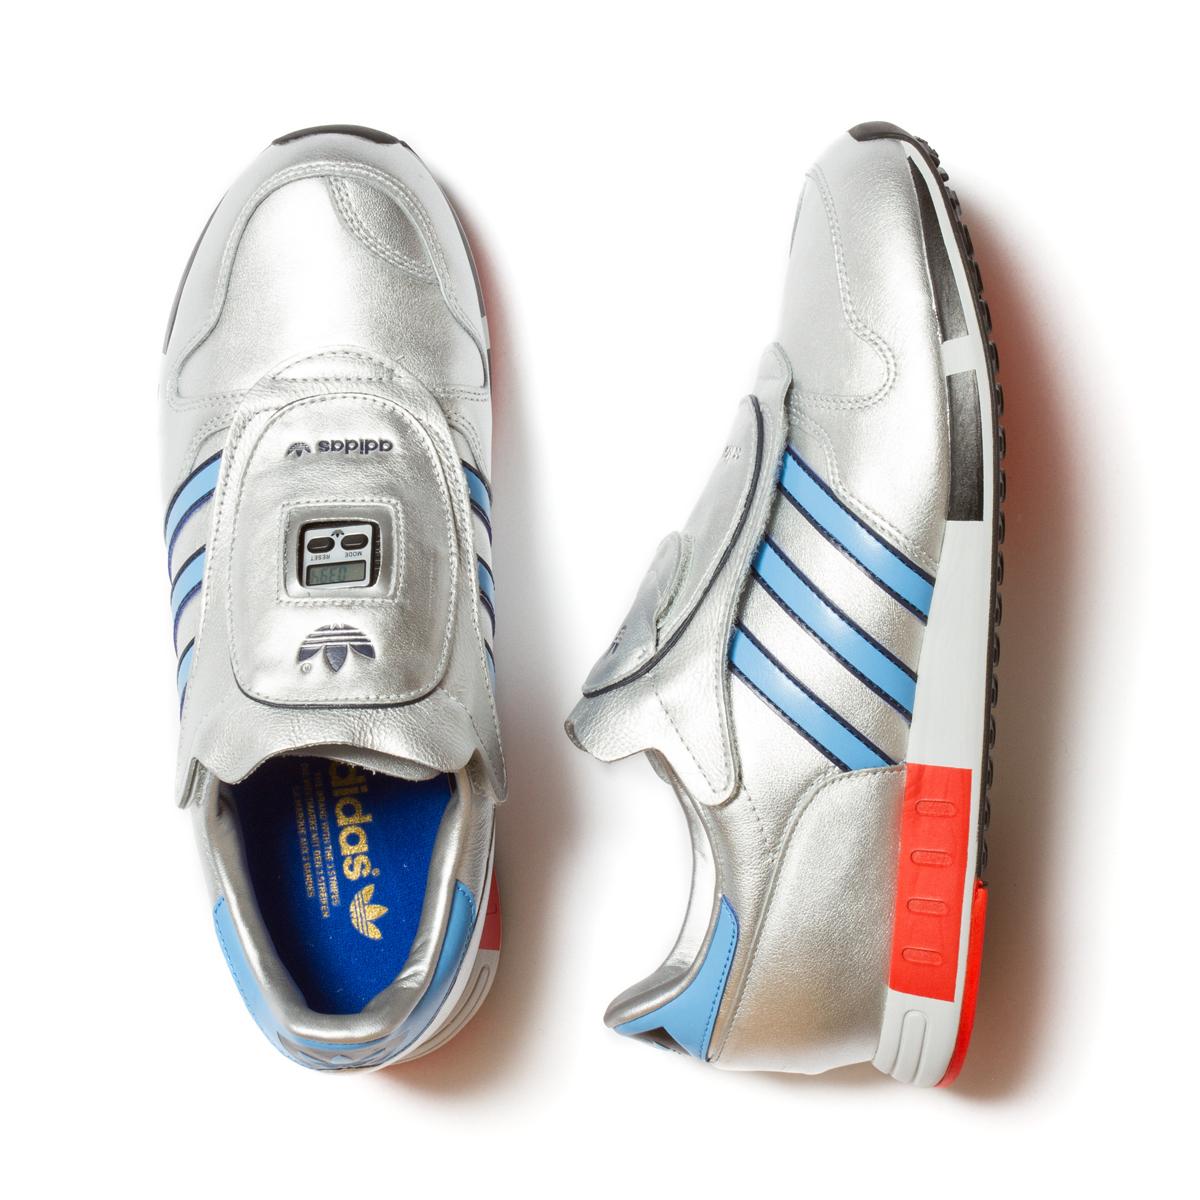 Adidas Micropacer OG £110